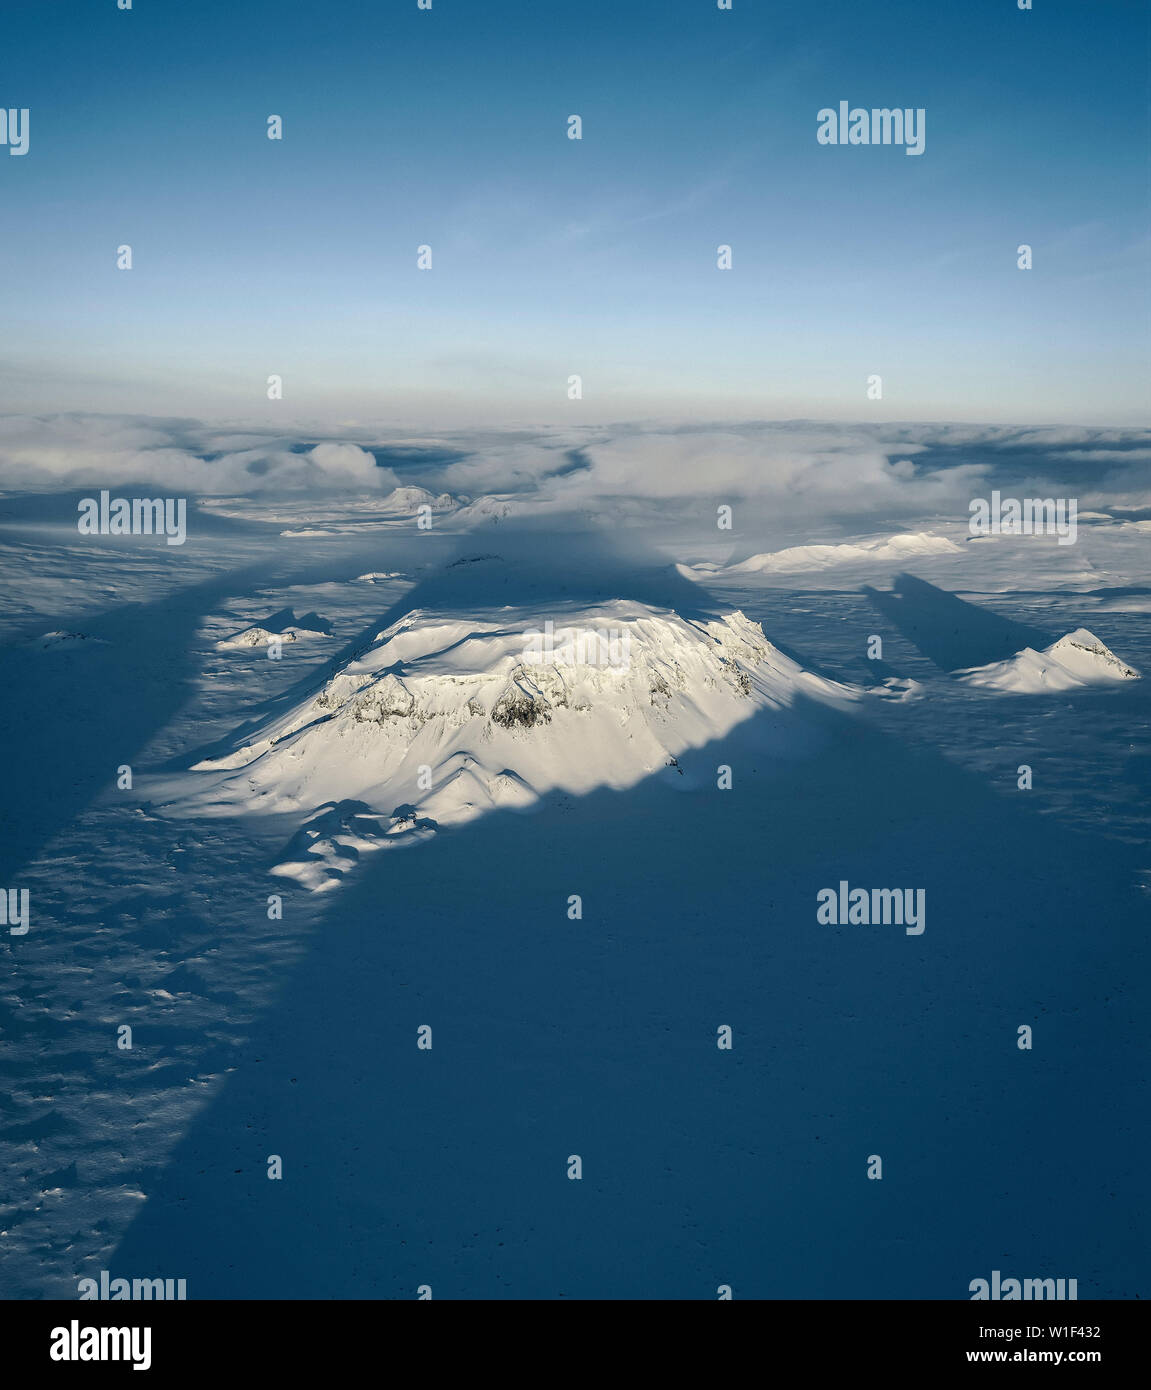 Antena, paisajes glaciares, Mt.Hlodufel sobre Langjokull casquete de hielo, Islandia Imagen De Stock